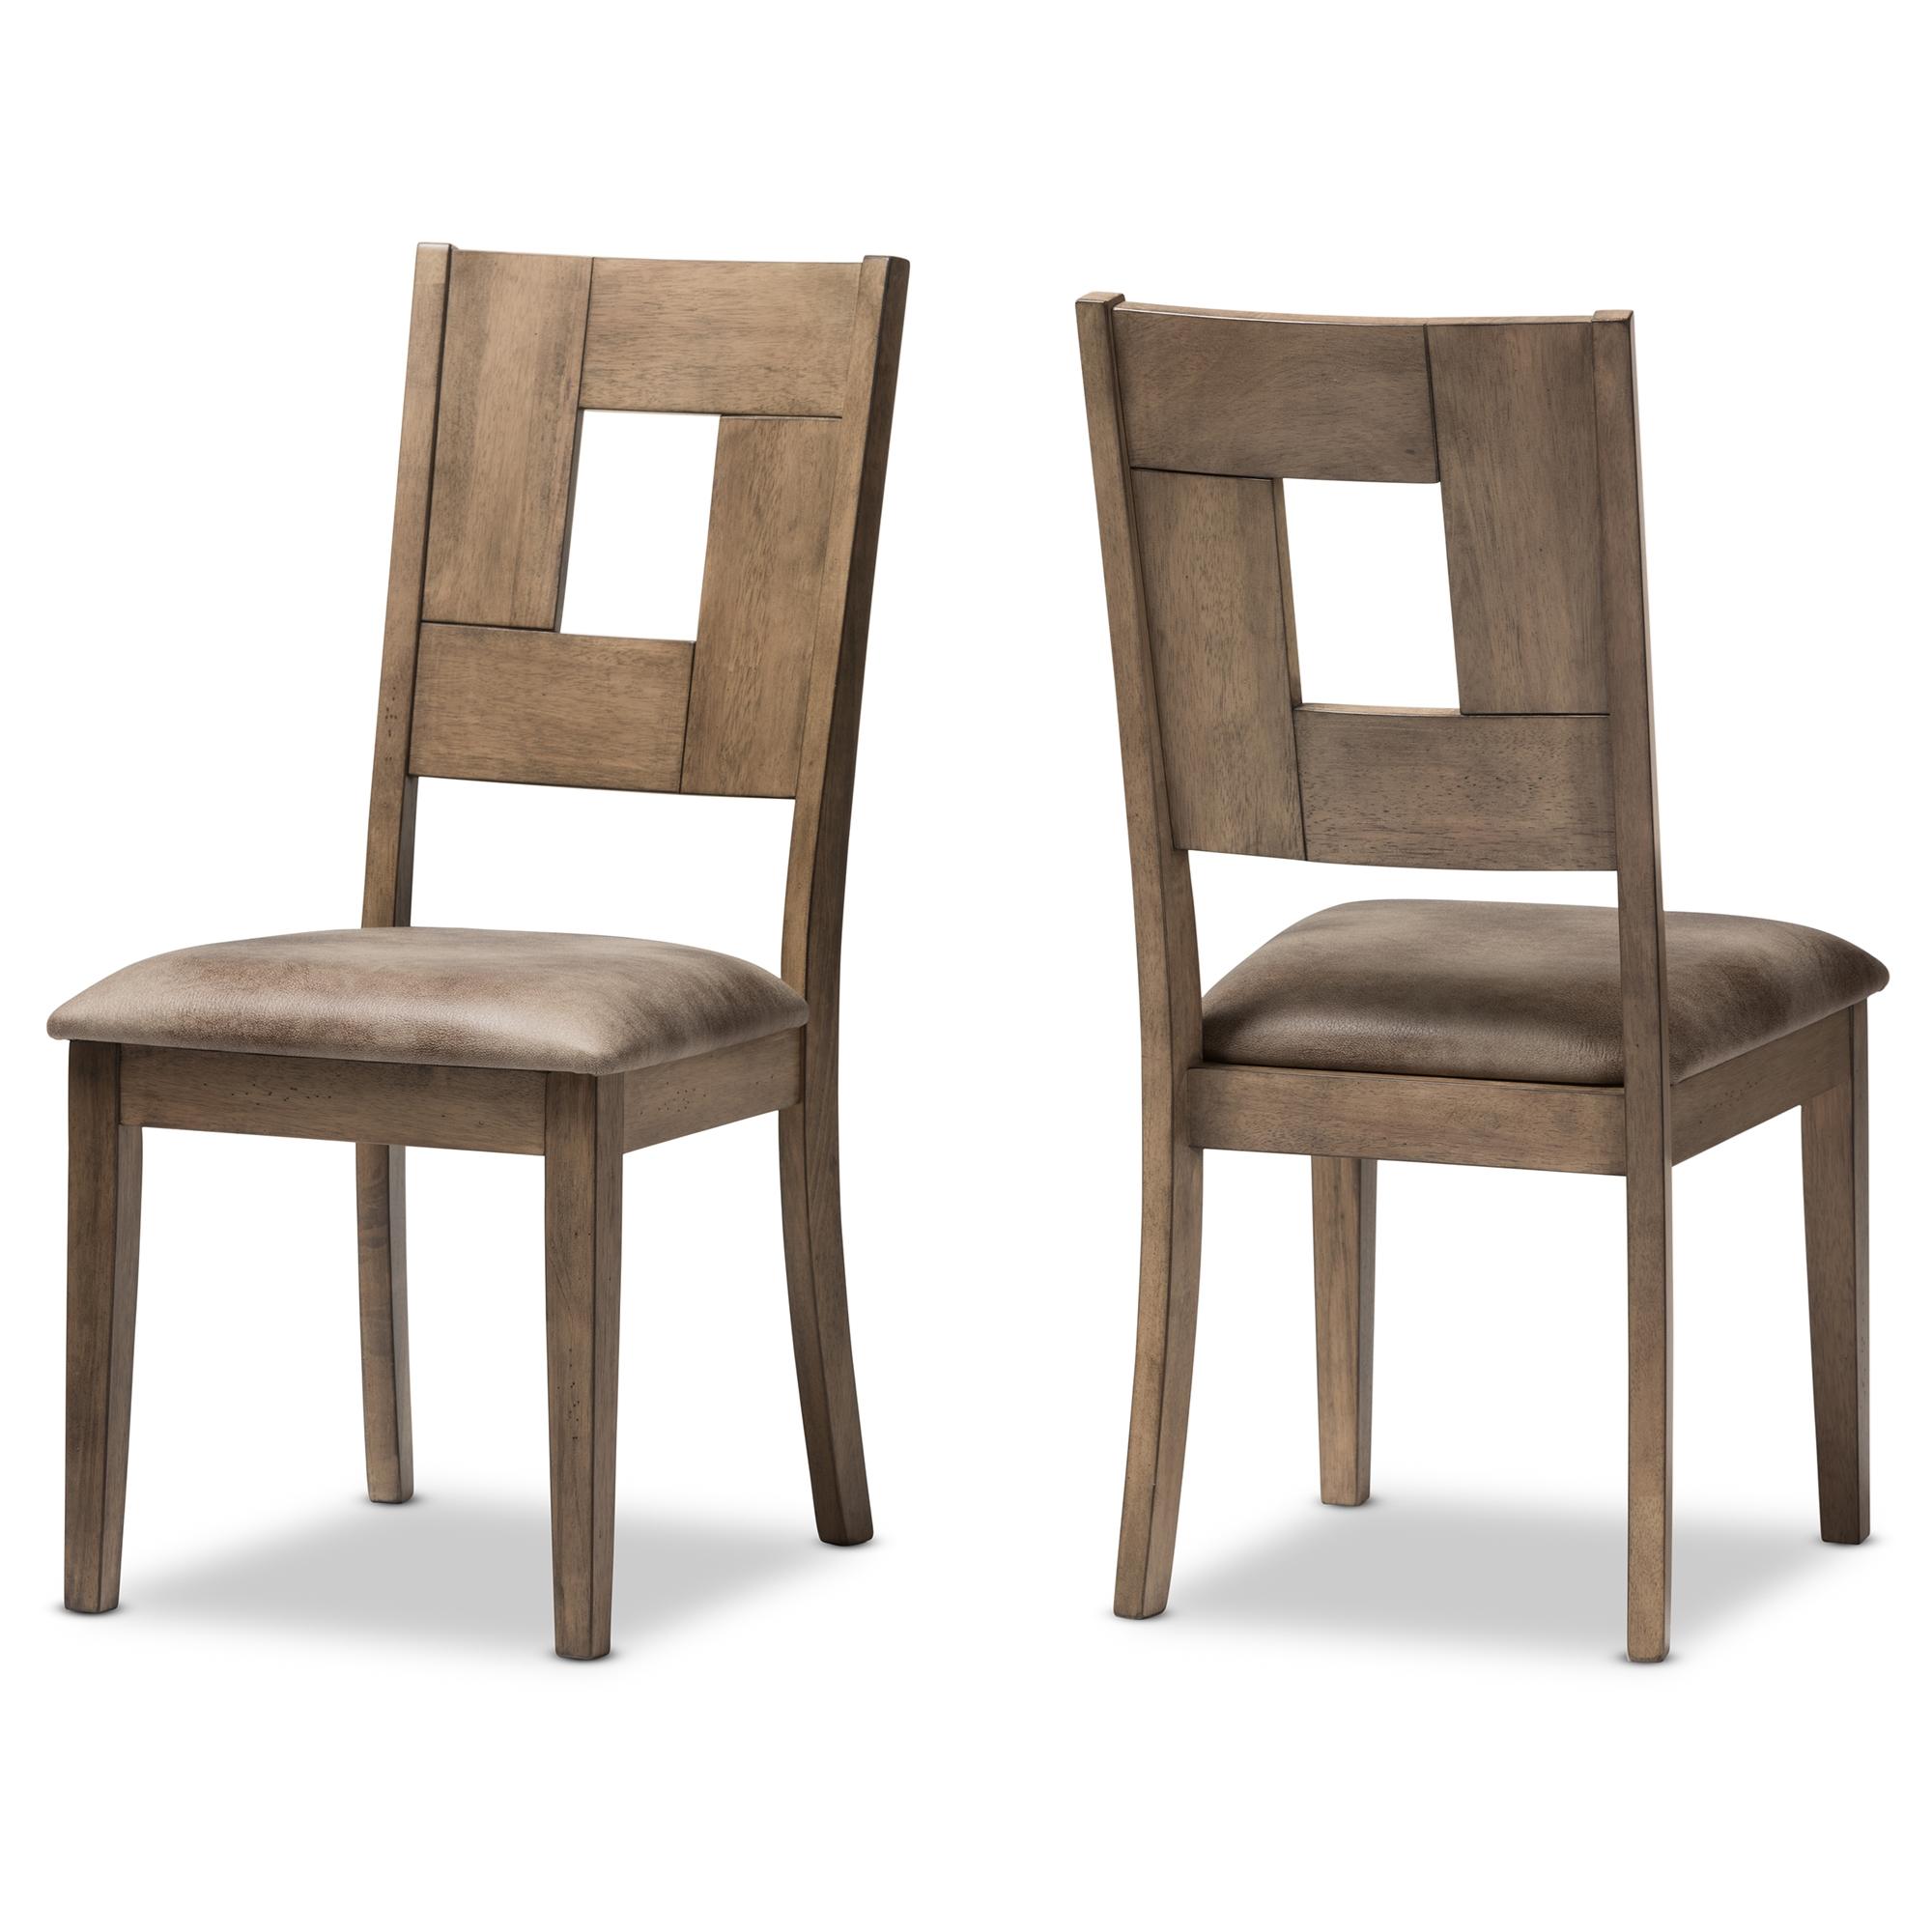 Good Baxton Studio   Wholesale Dining Chairs   Wholesale Dining Room Furniture    Wholesale Furniture